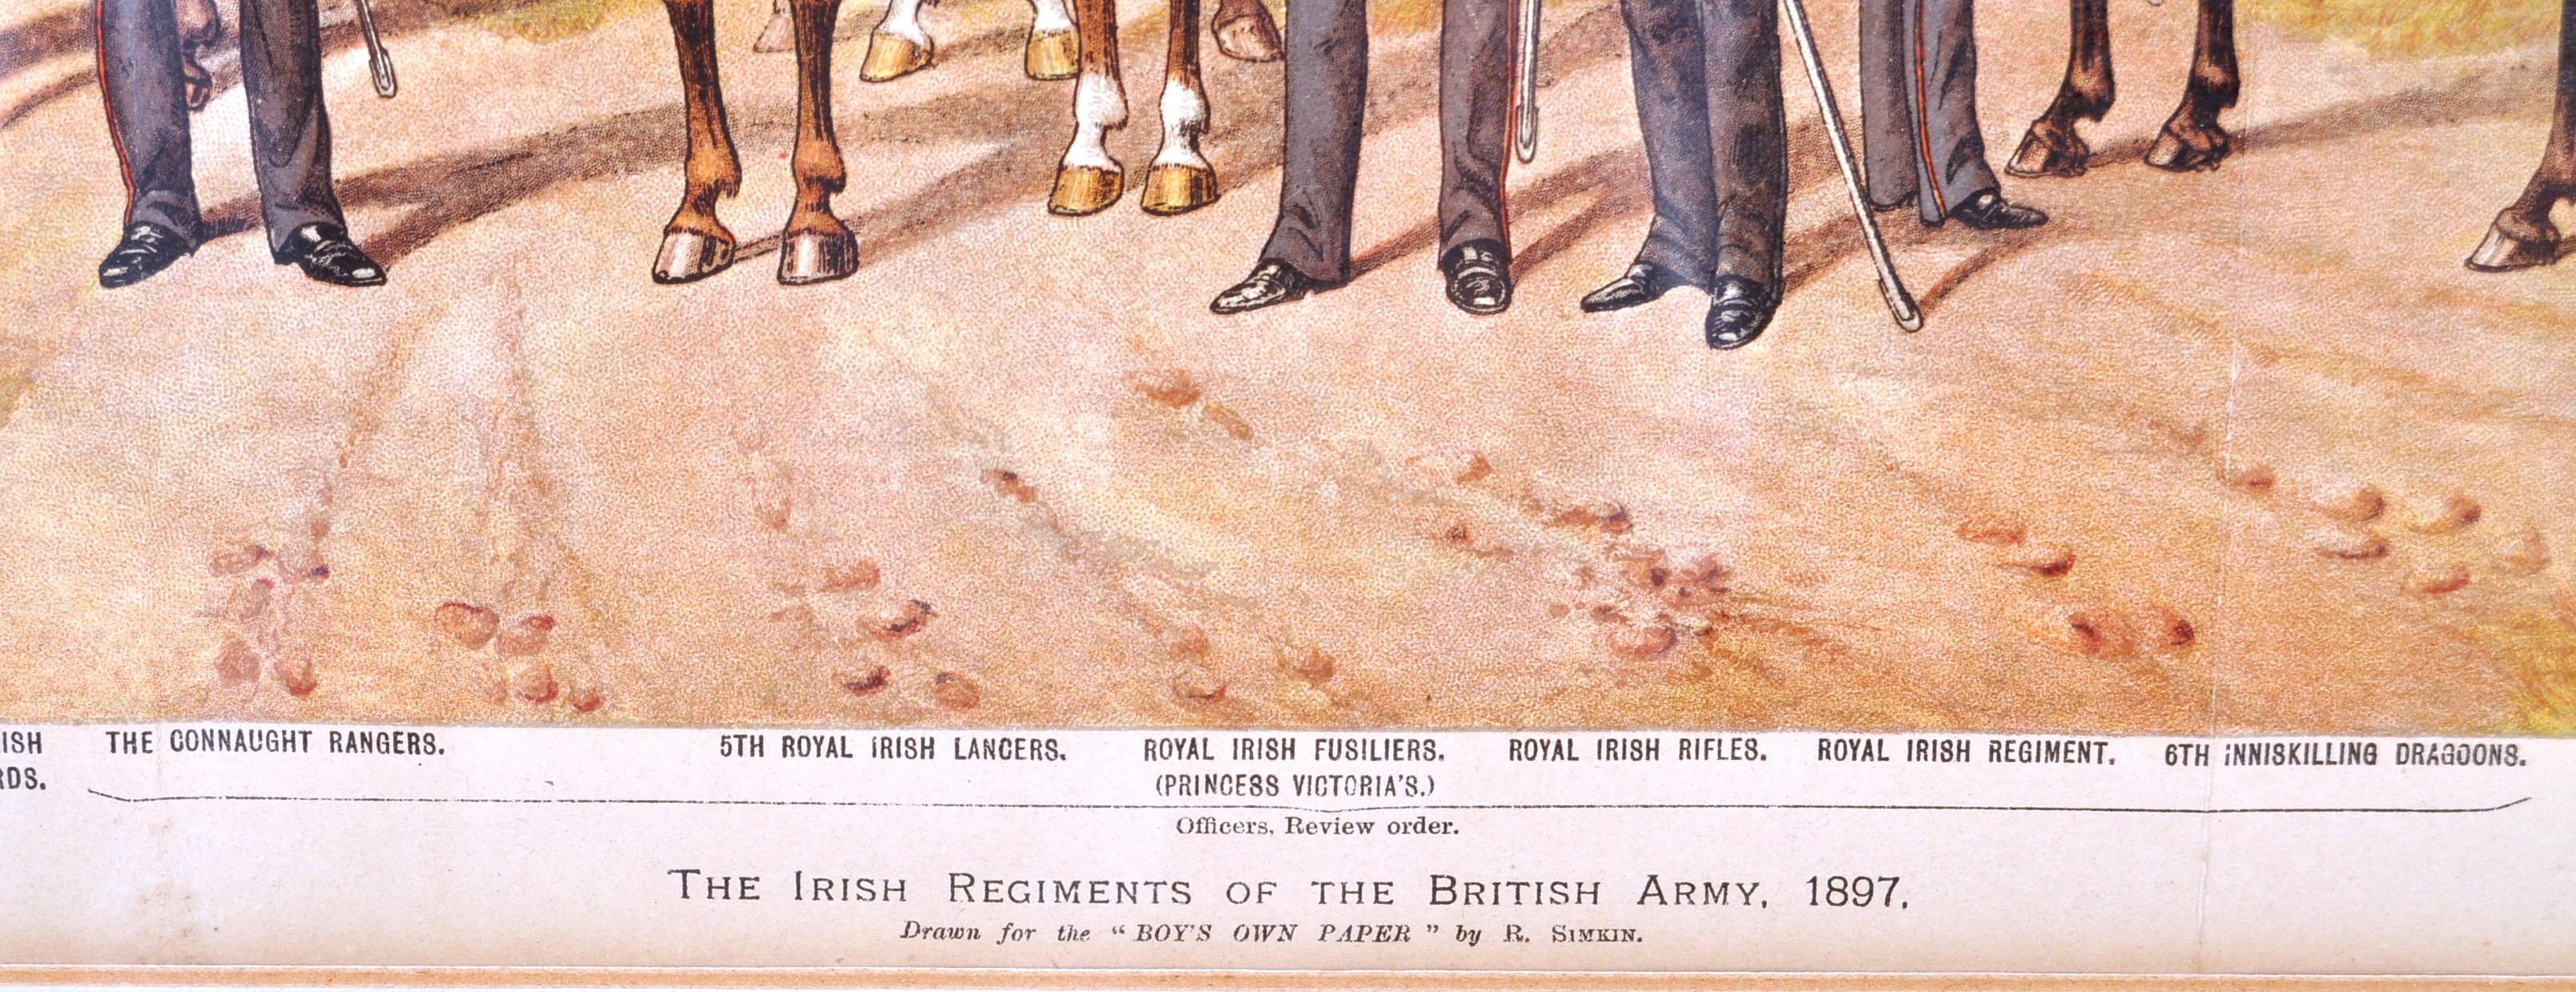 RICHARD SIMKIN - THE IRISH REGIMENTS OF THE BRITISH ARMY - Image 5 of 7